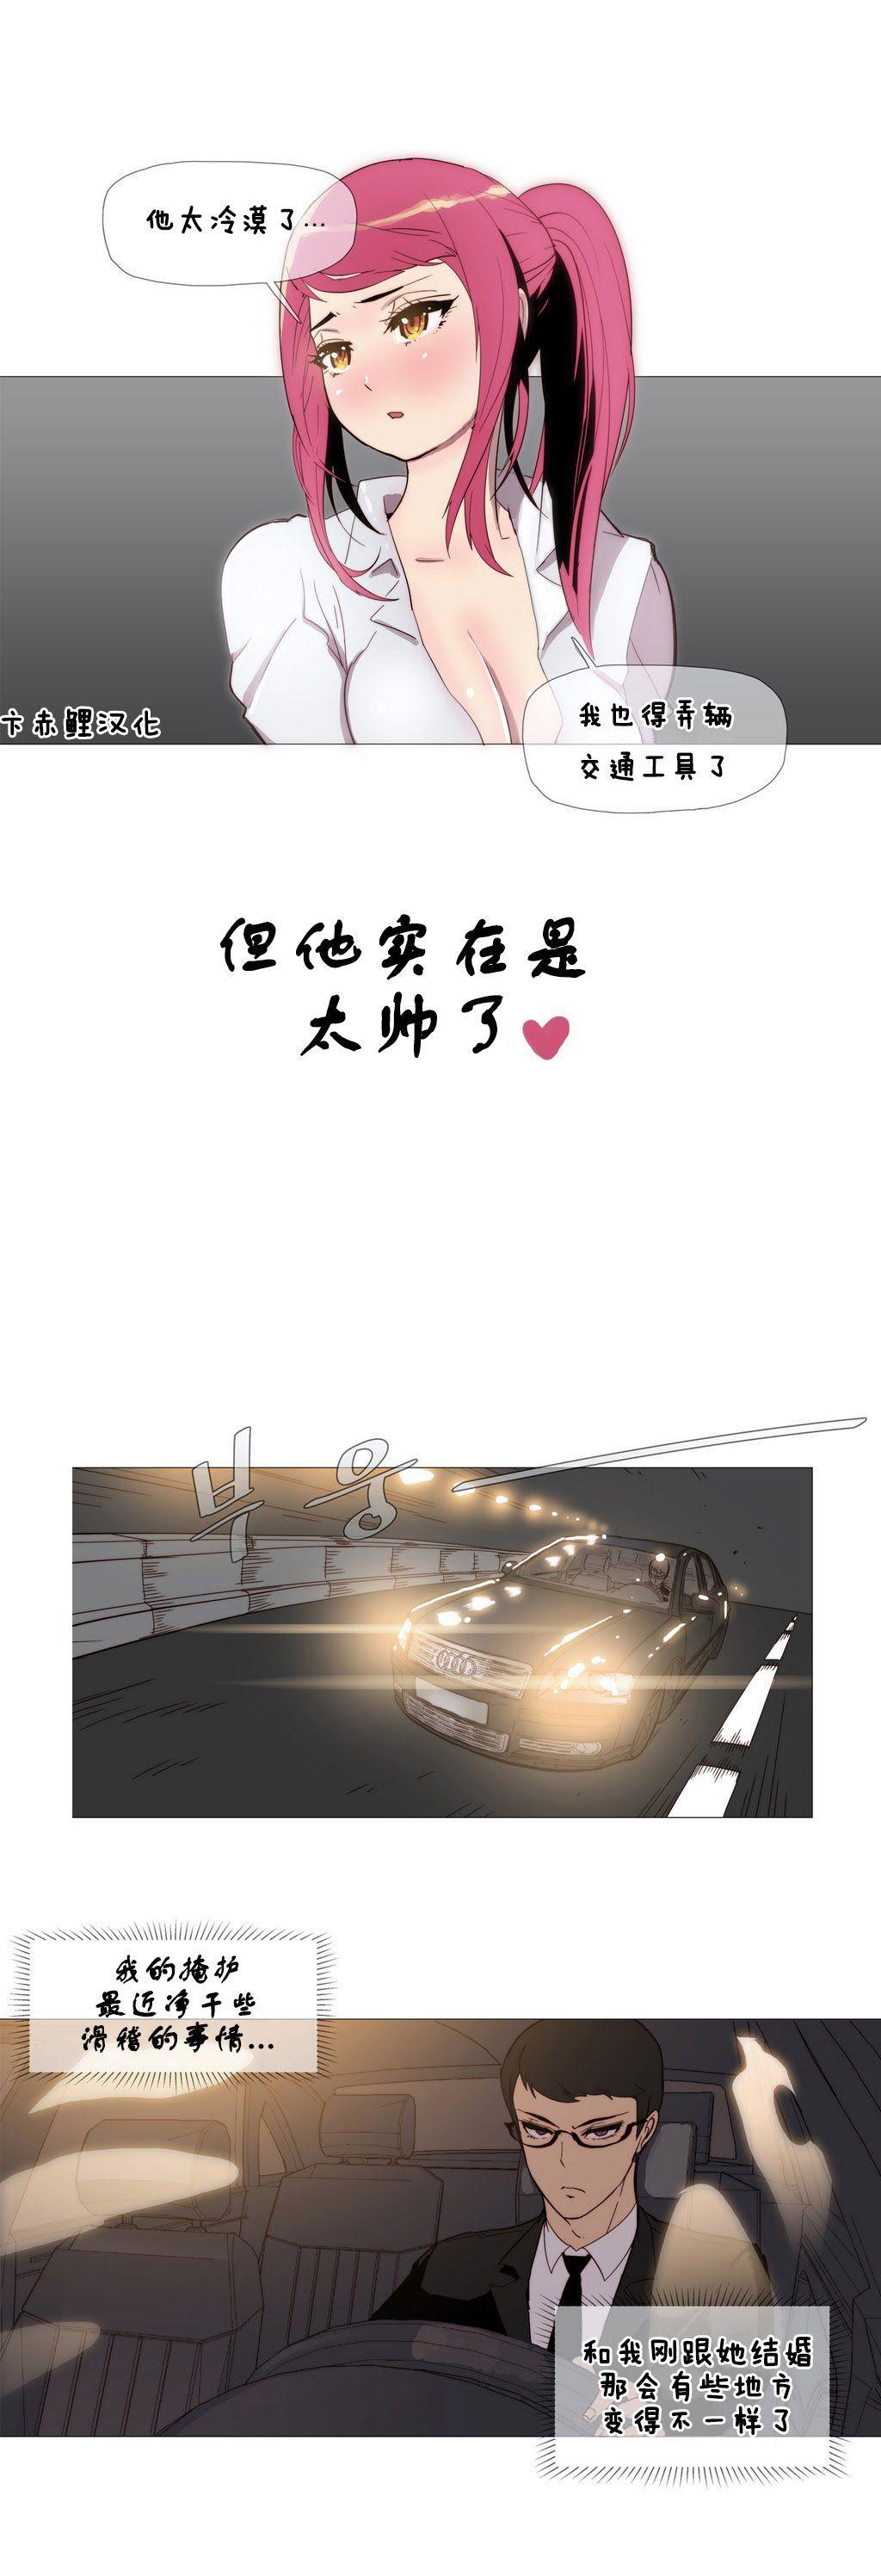 HouseHold Affairs 【卞赤鲤汉化】1~15话 47